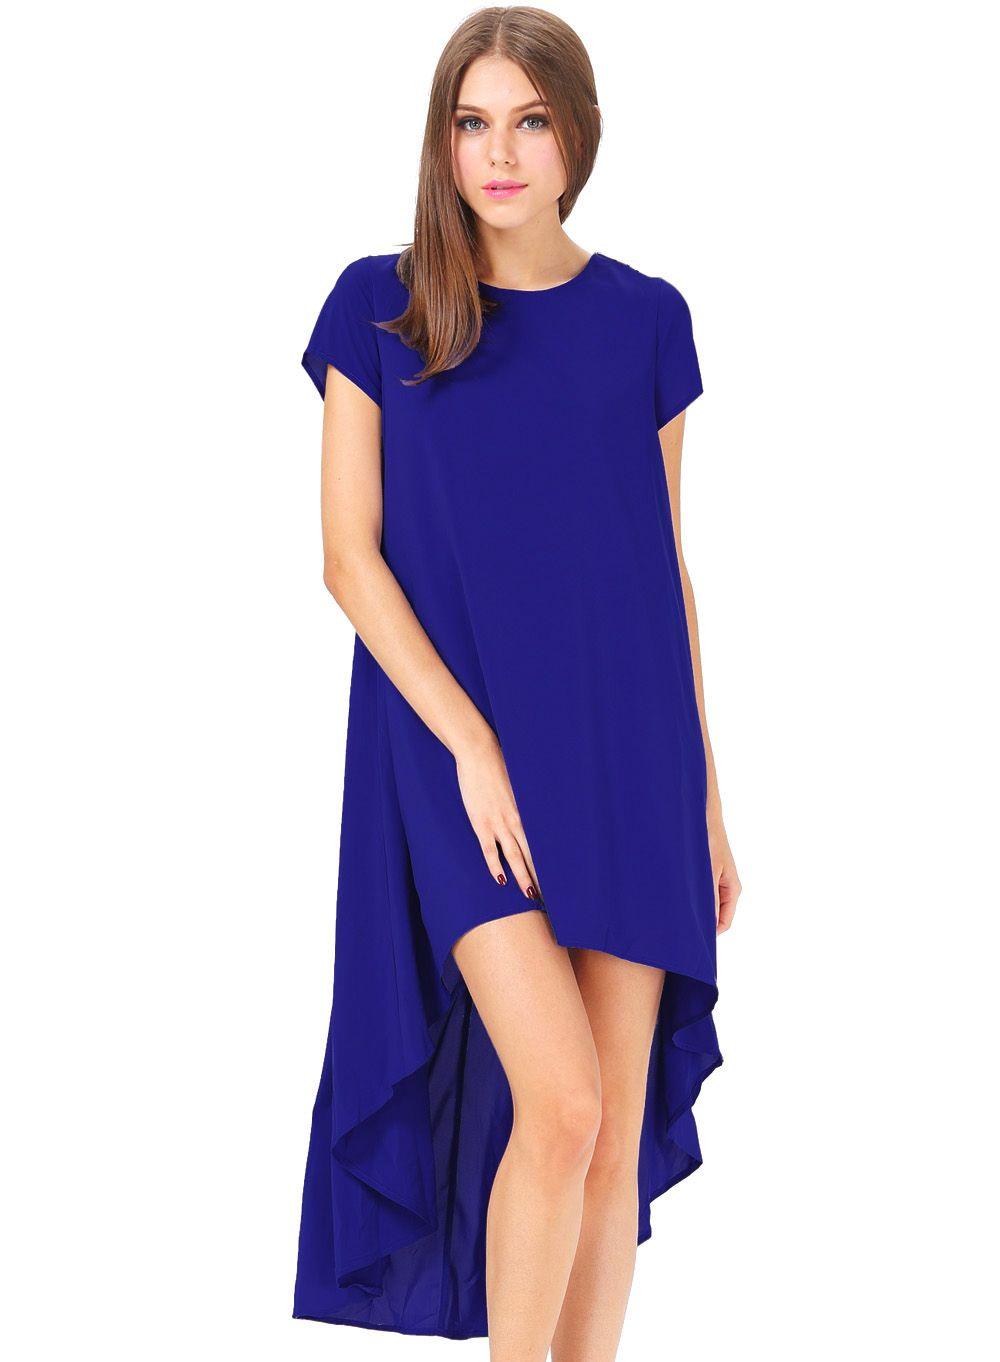 Vestido asimétrico mangas cortas-Azul 17.59   Dresses by aisha ...